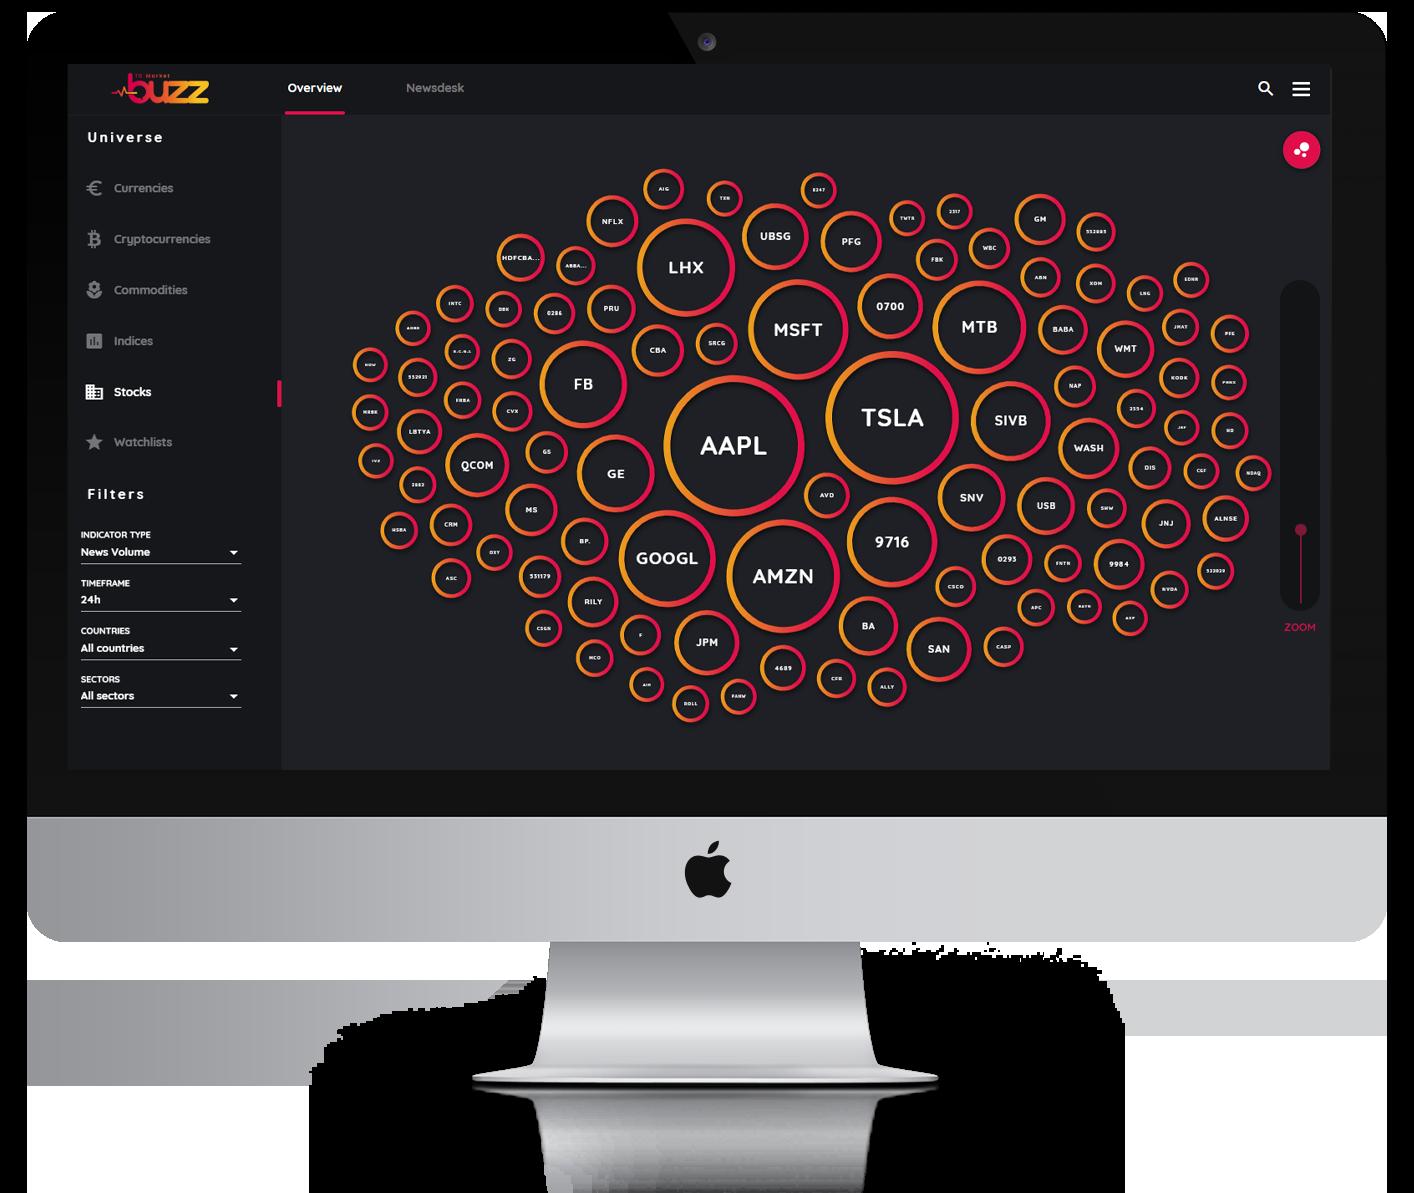 TC Market Buzz desktop mock up. Explore trending stocks based on the news